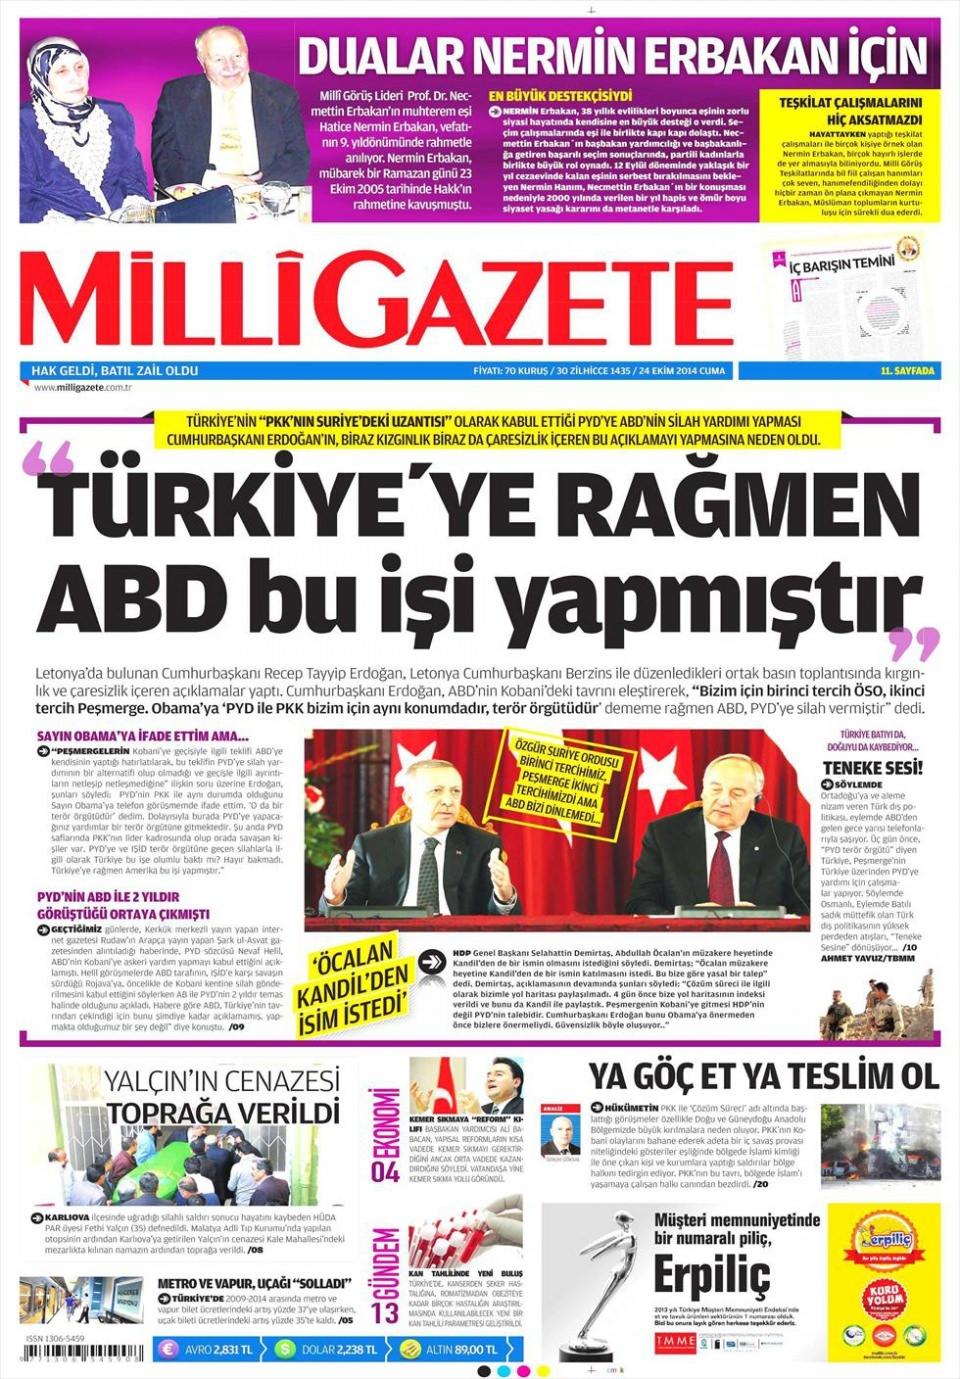 24 Ekim 2014 gazete manşetleri 11